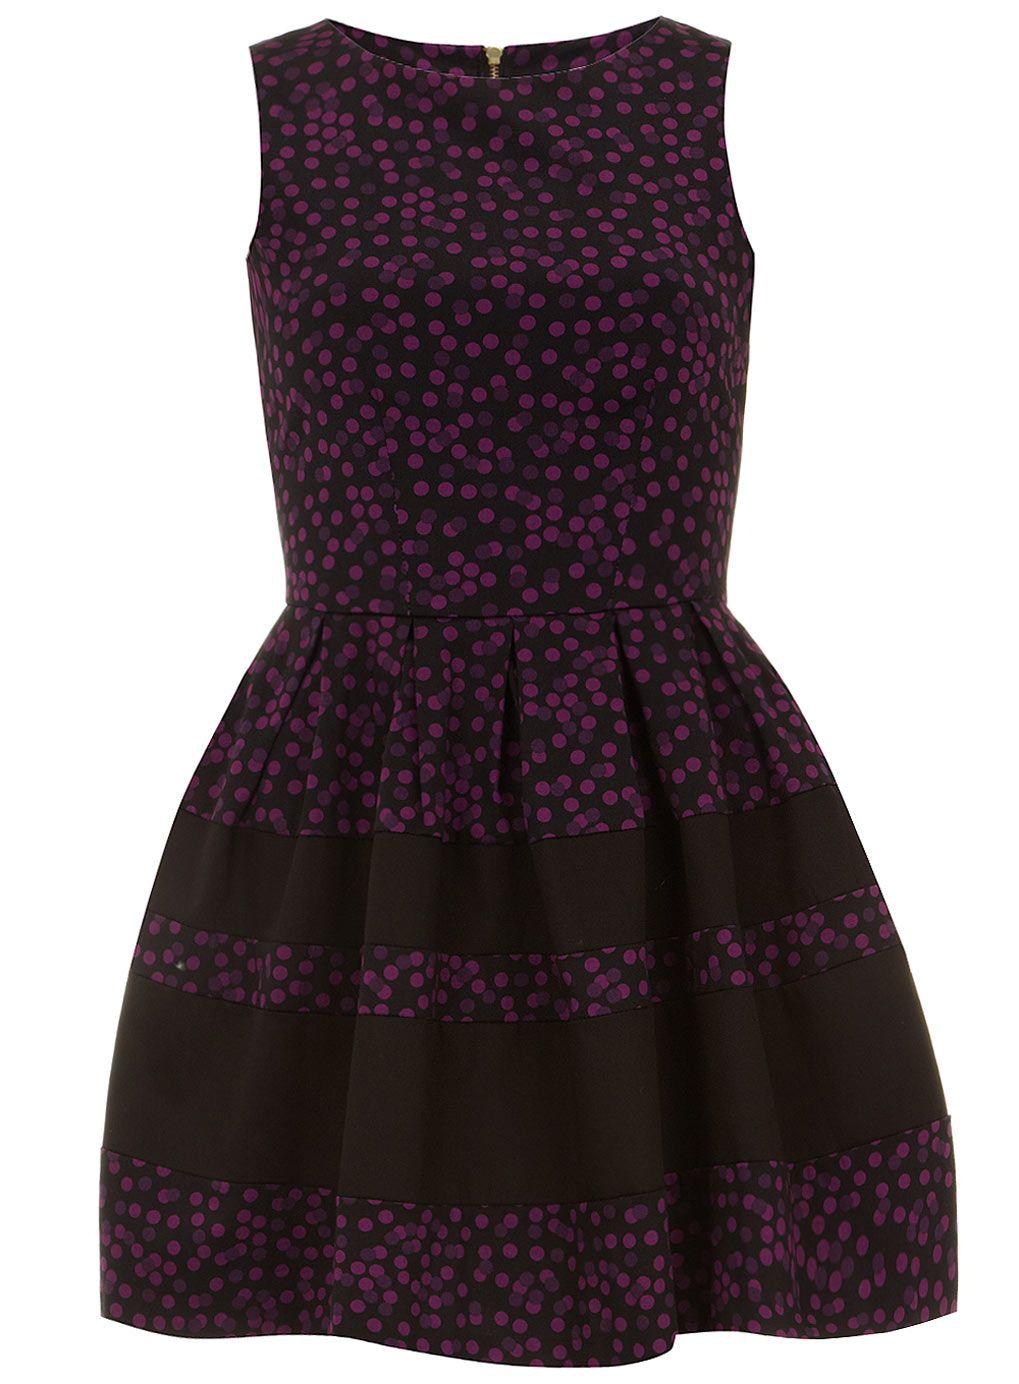 Purple spot contrast dress - Party Dresses - Party - Dorothy Perkins